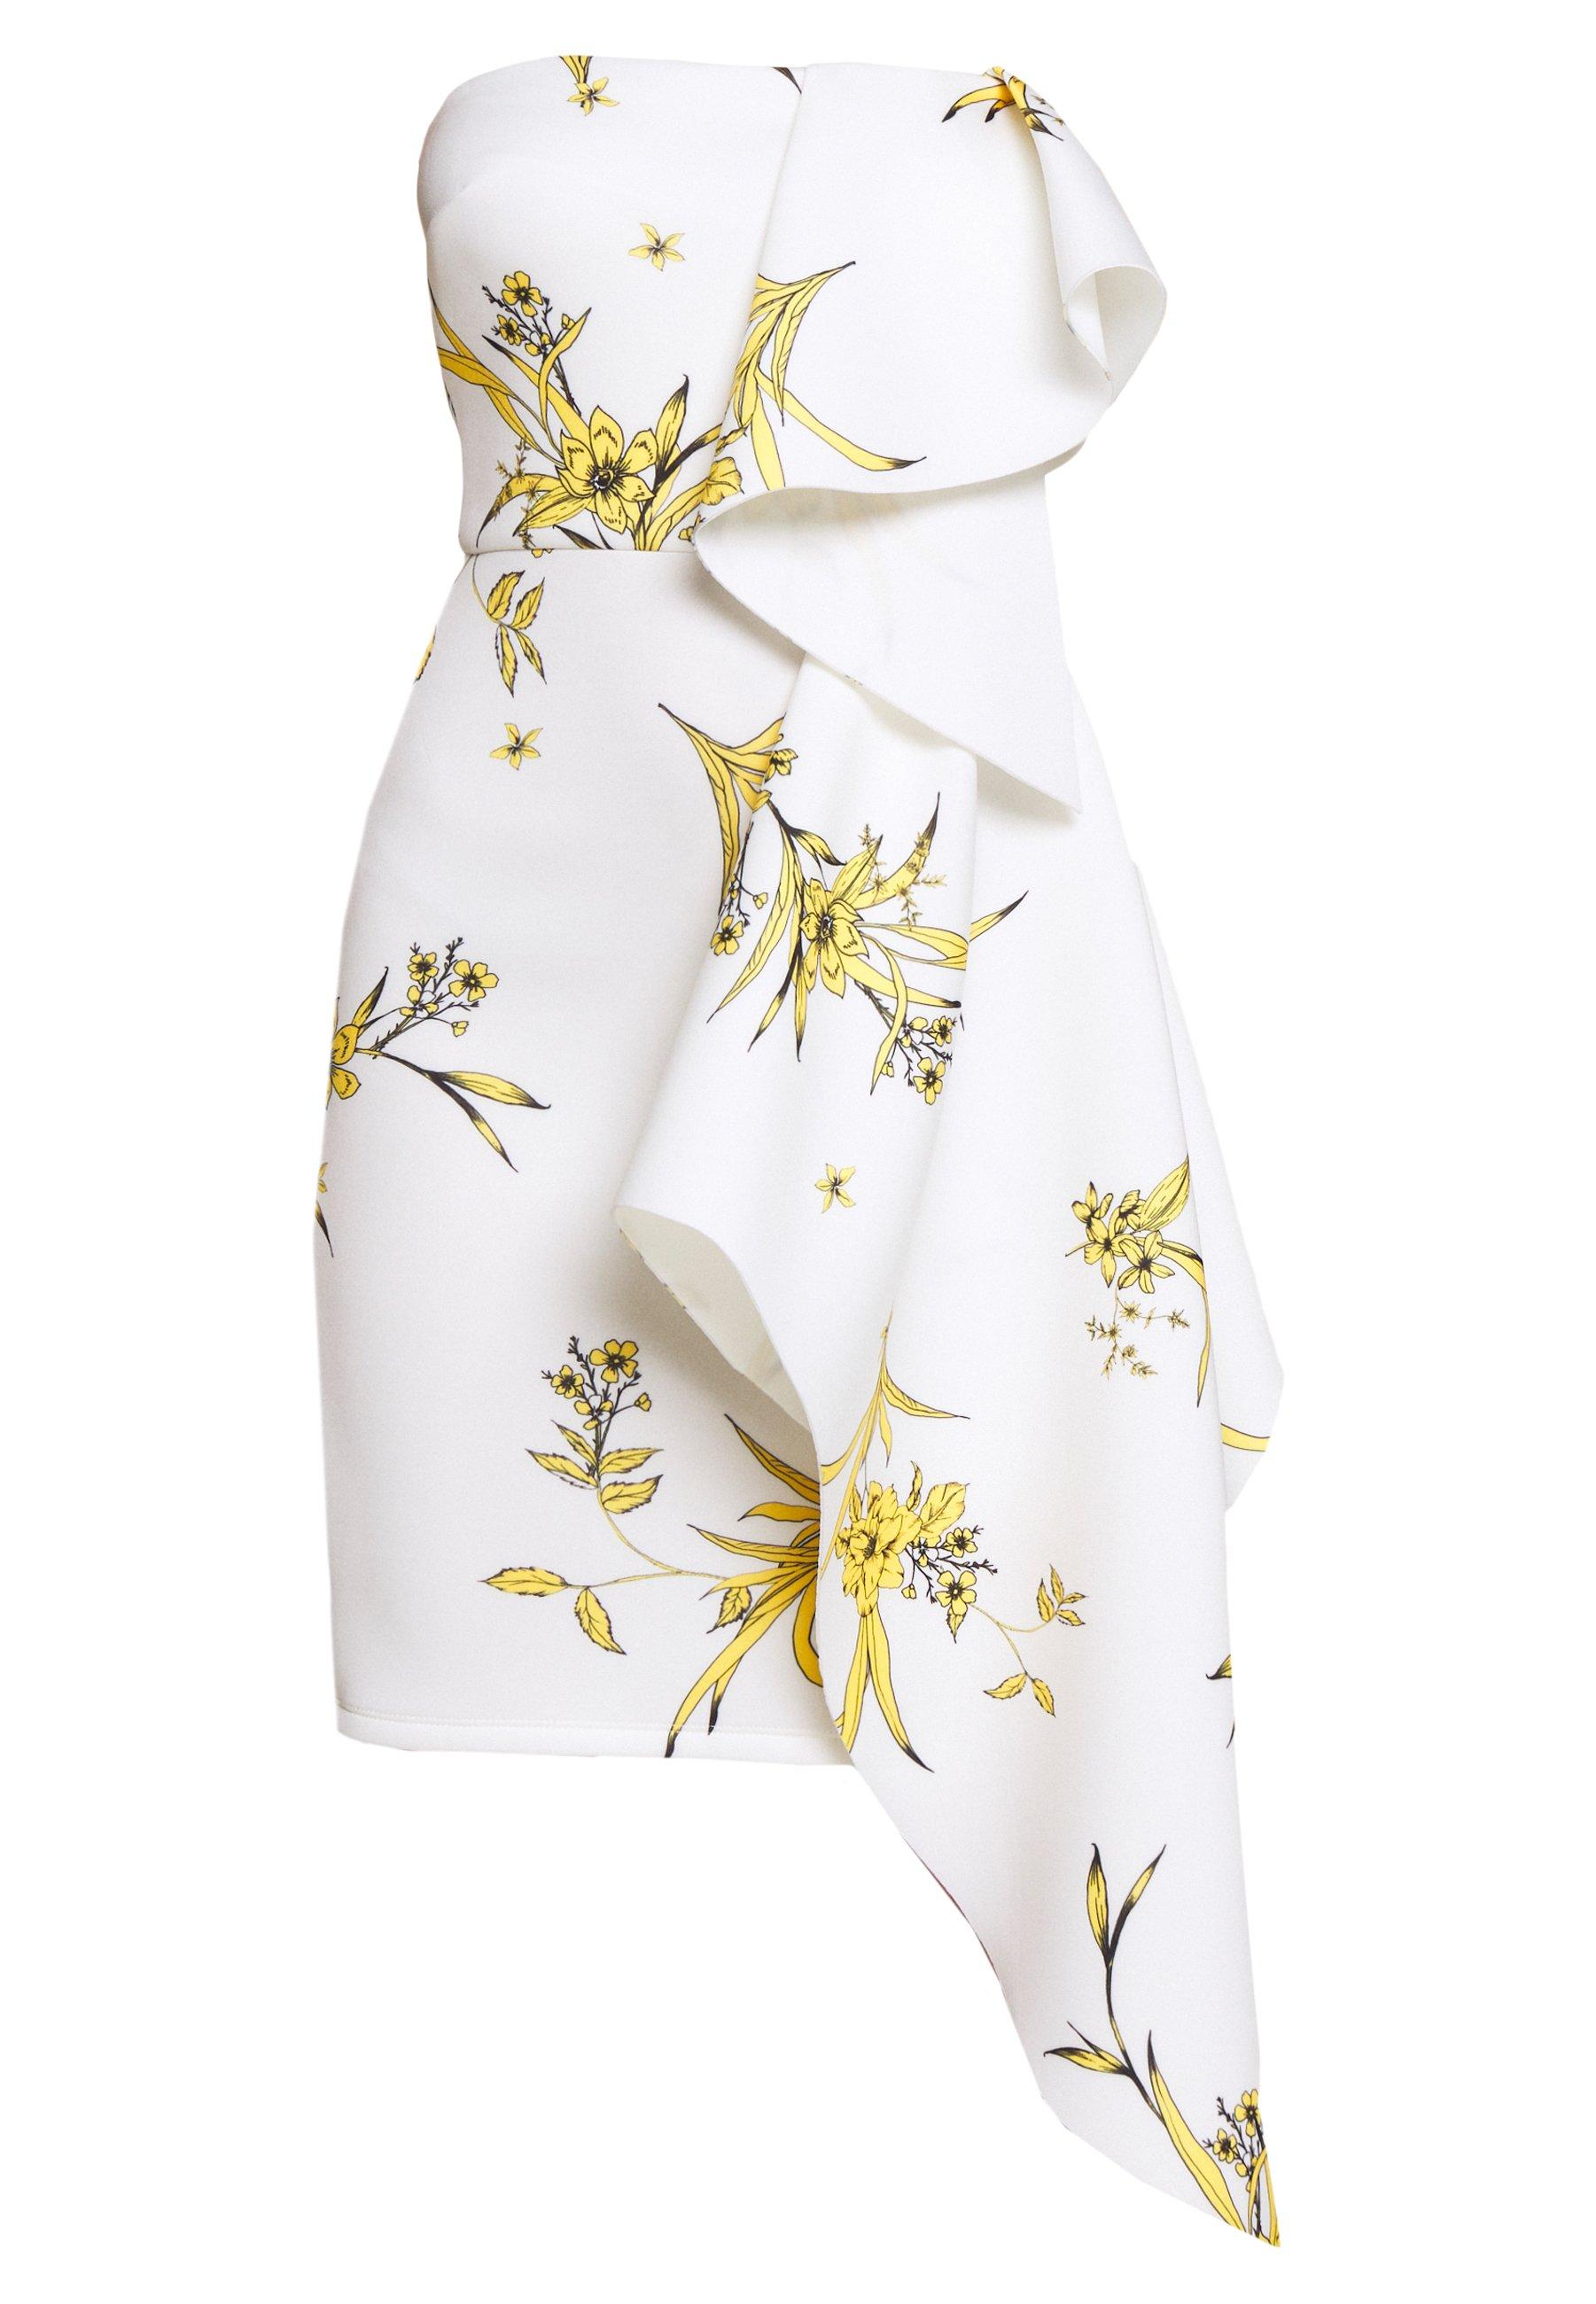 True Violet Petite Bandeau Mini Dress With Peplum Petite Cocktailkleid Festliches Kleid Ivory Weiss Zalando De